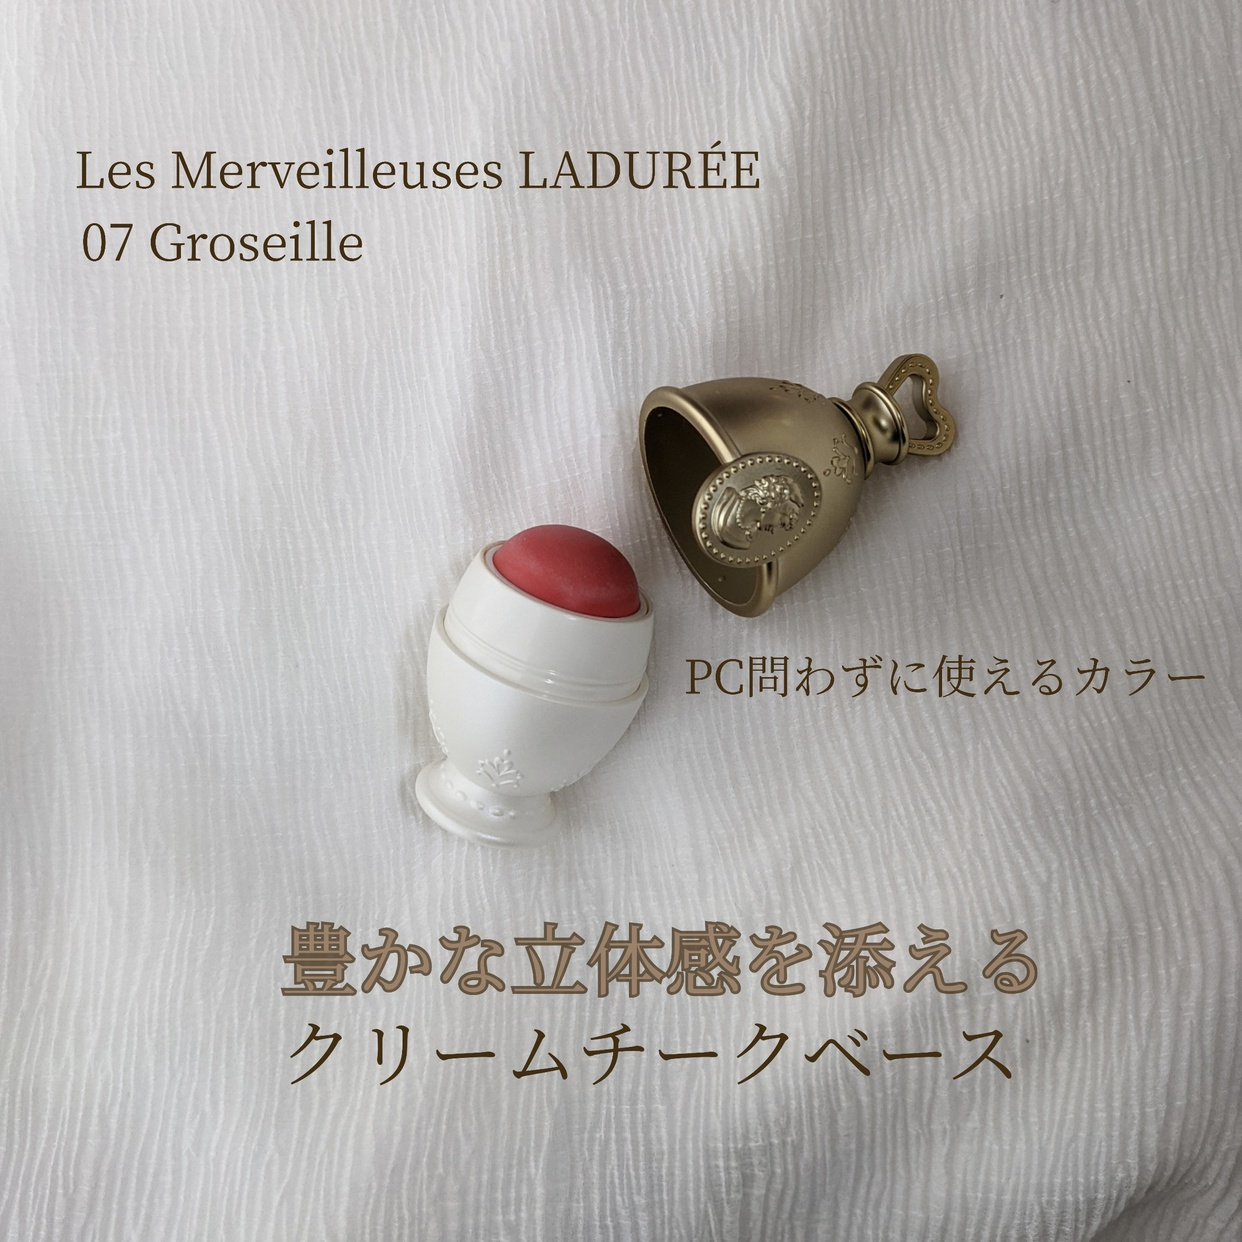 Les Merveilleuses LADURÉE(レ・メルヴェイユーズ ラデュレ) クリーム チーク ベースを使ったLilyさんのクチコミ画像1